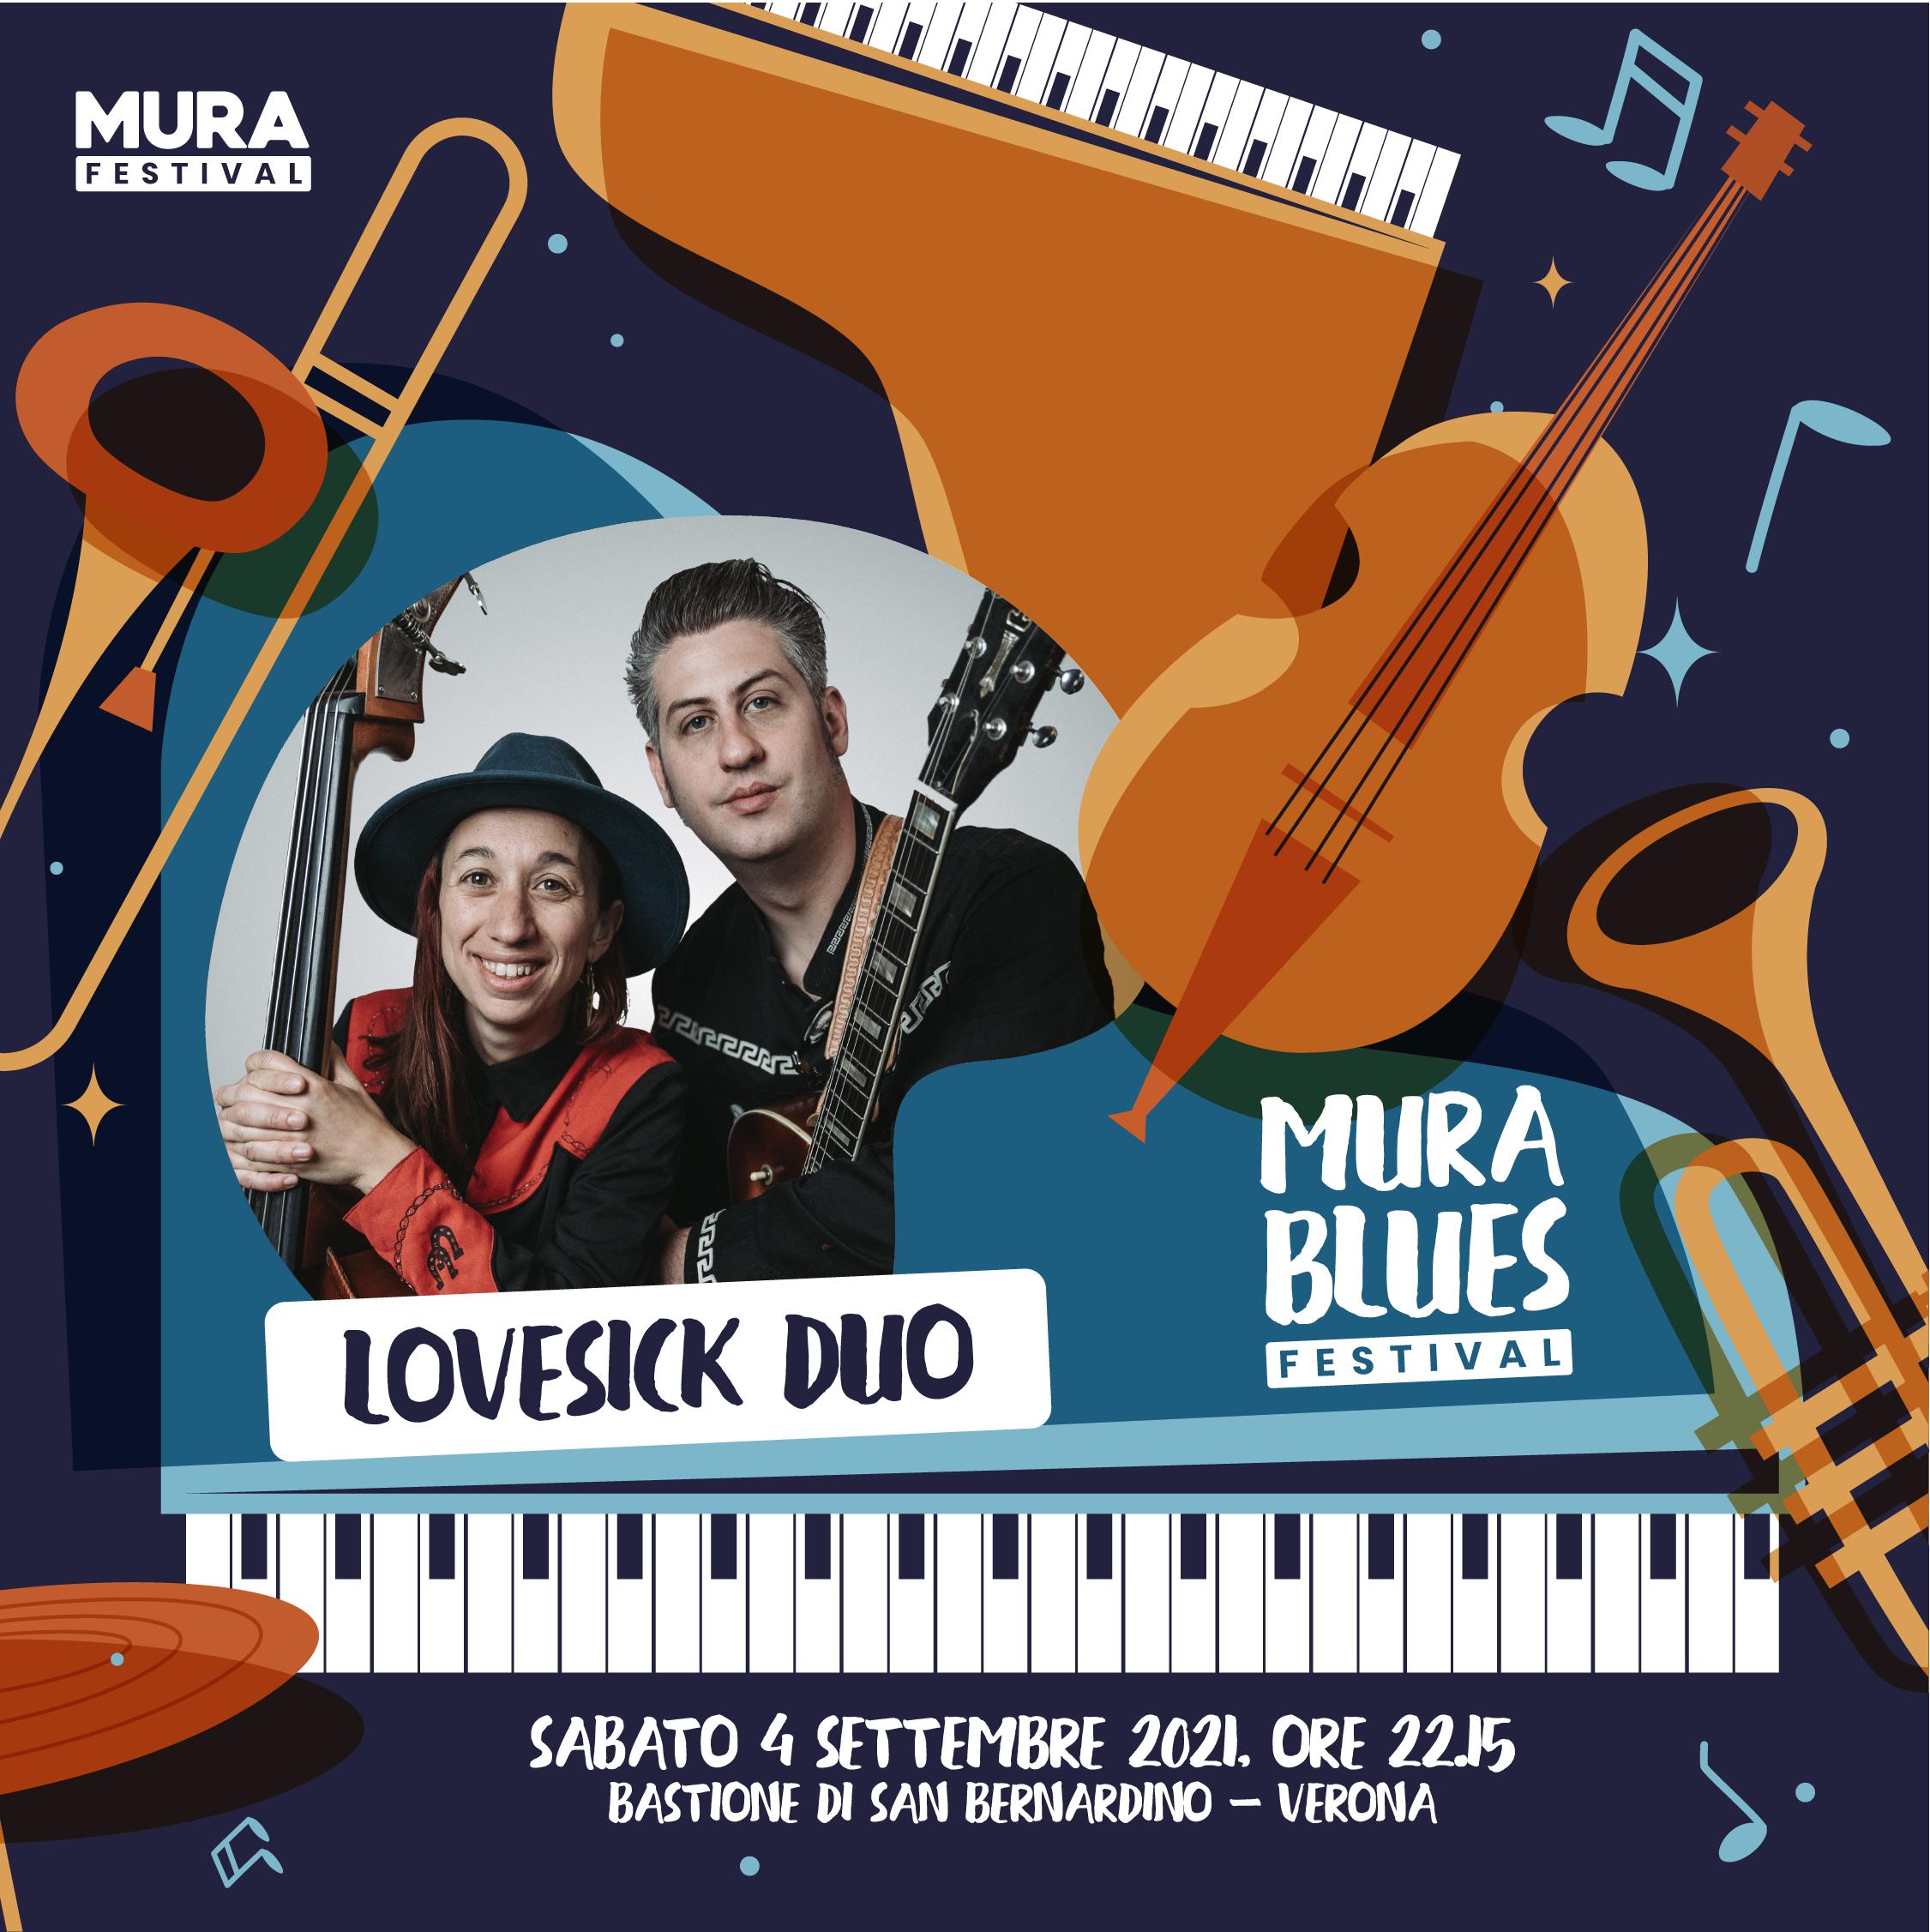 Mura Blues Festival Lovesick Duo